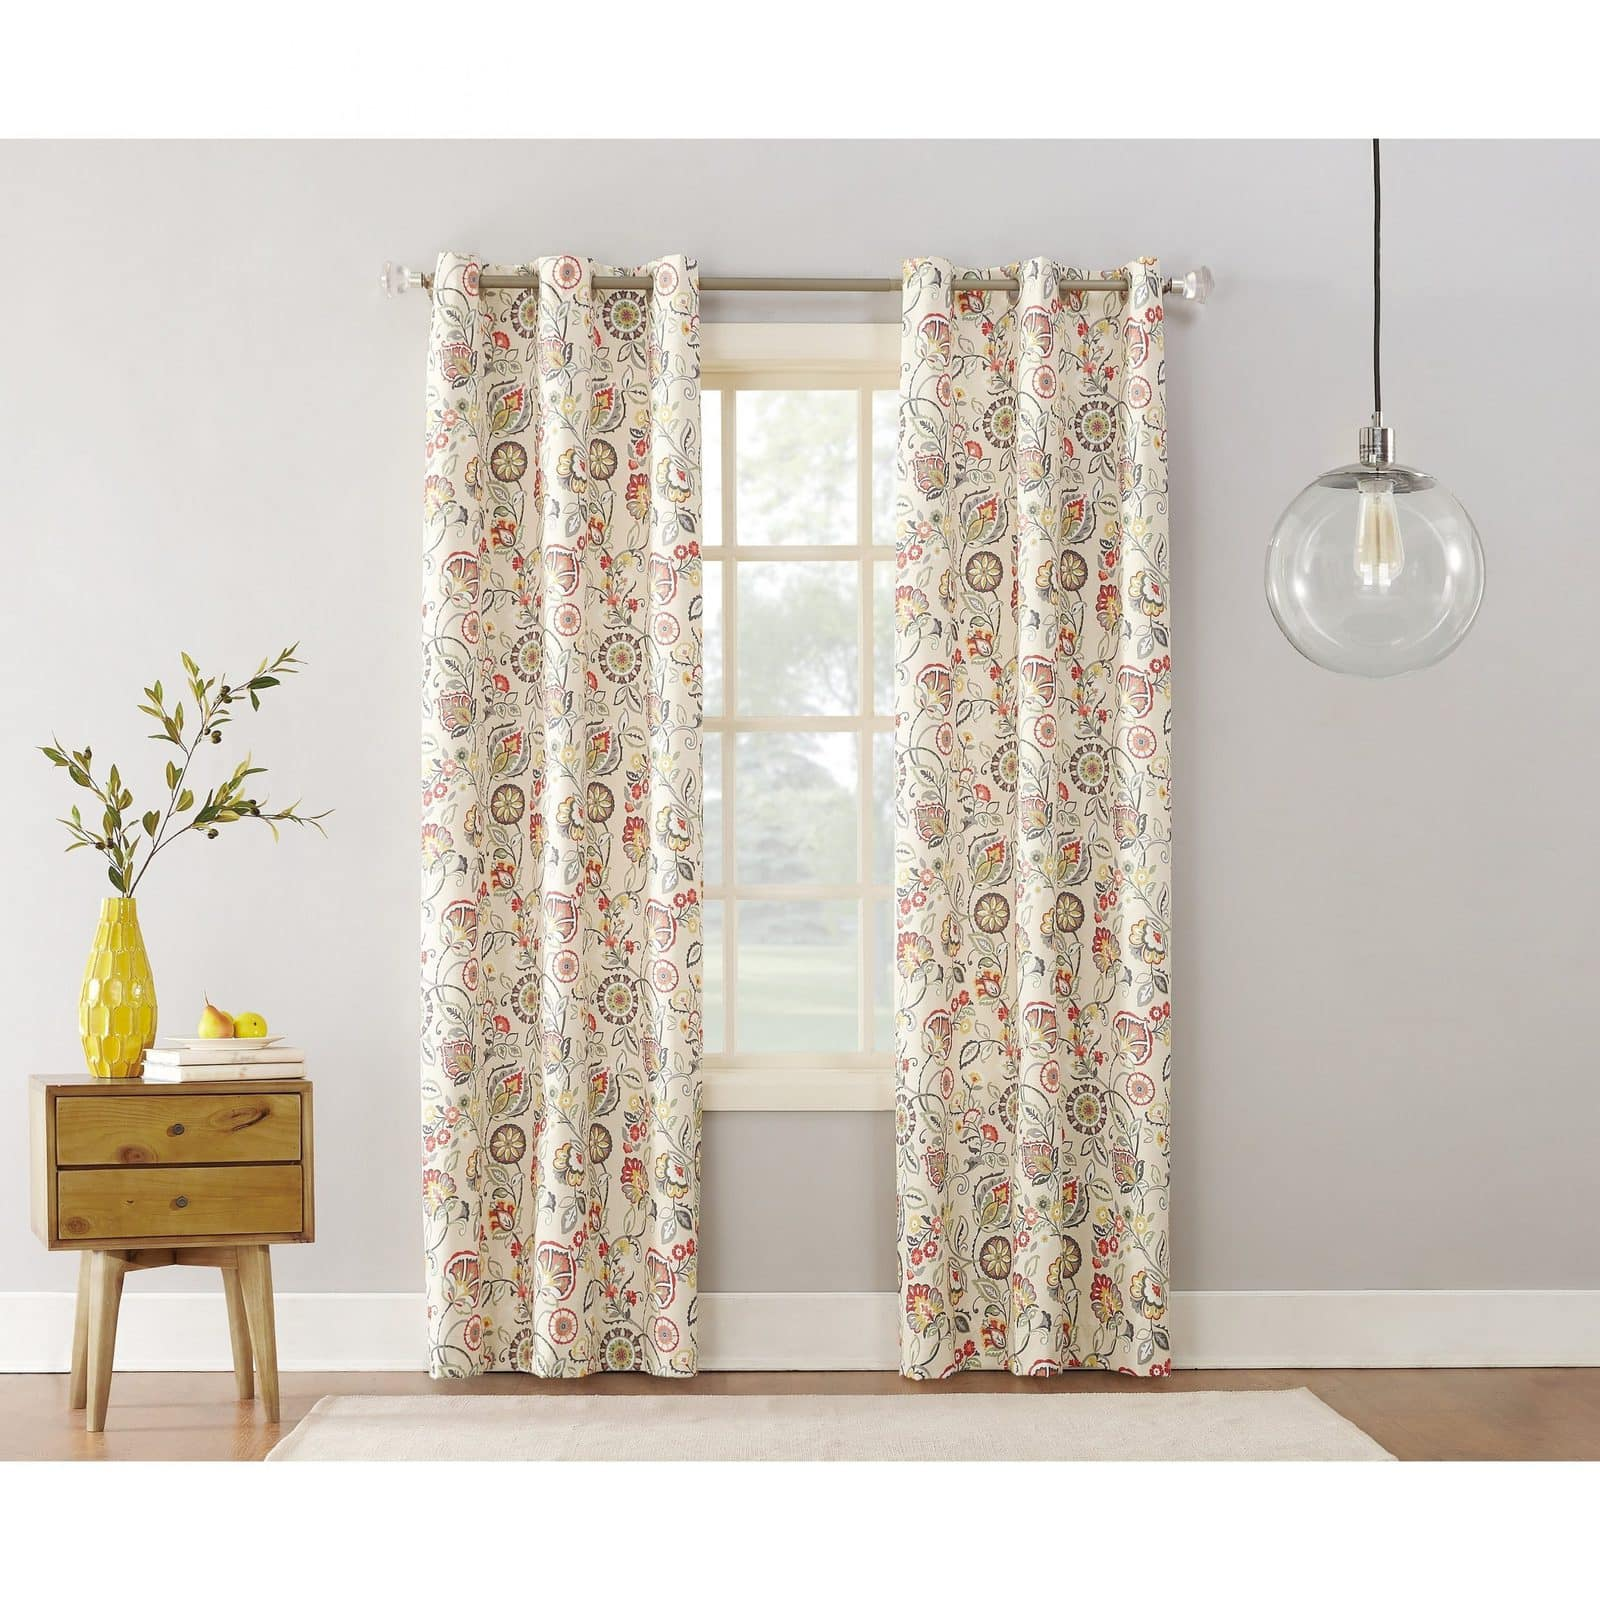 Botanical Print Curtains